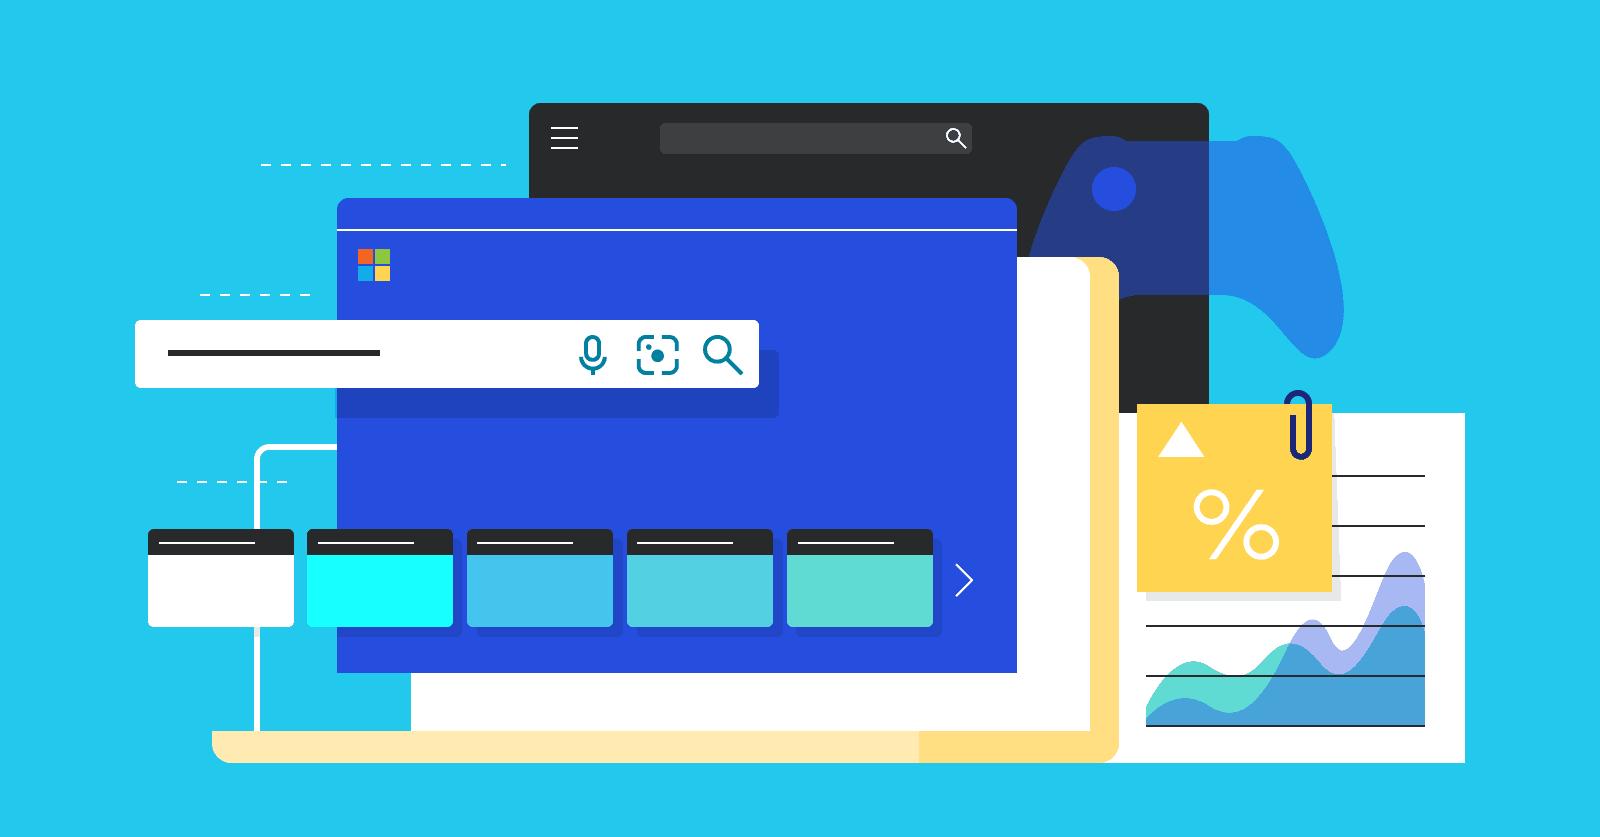 Microsoft Bing Usage and Revenue Stats